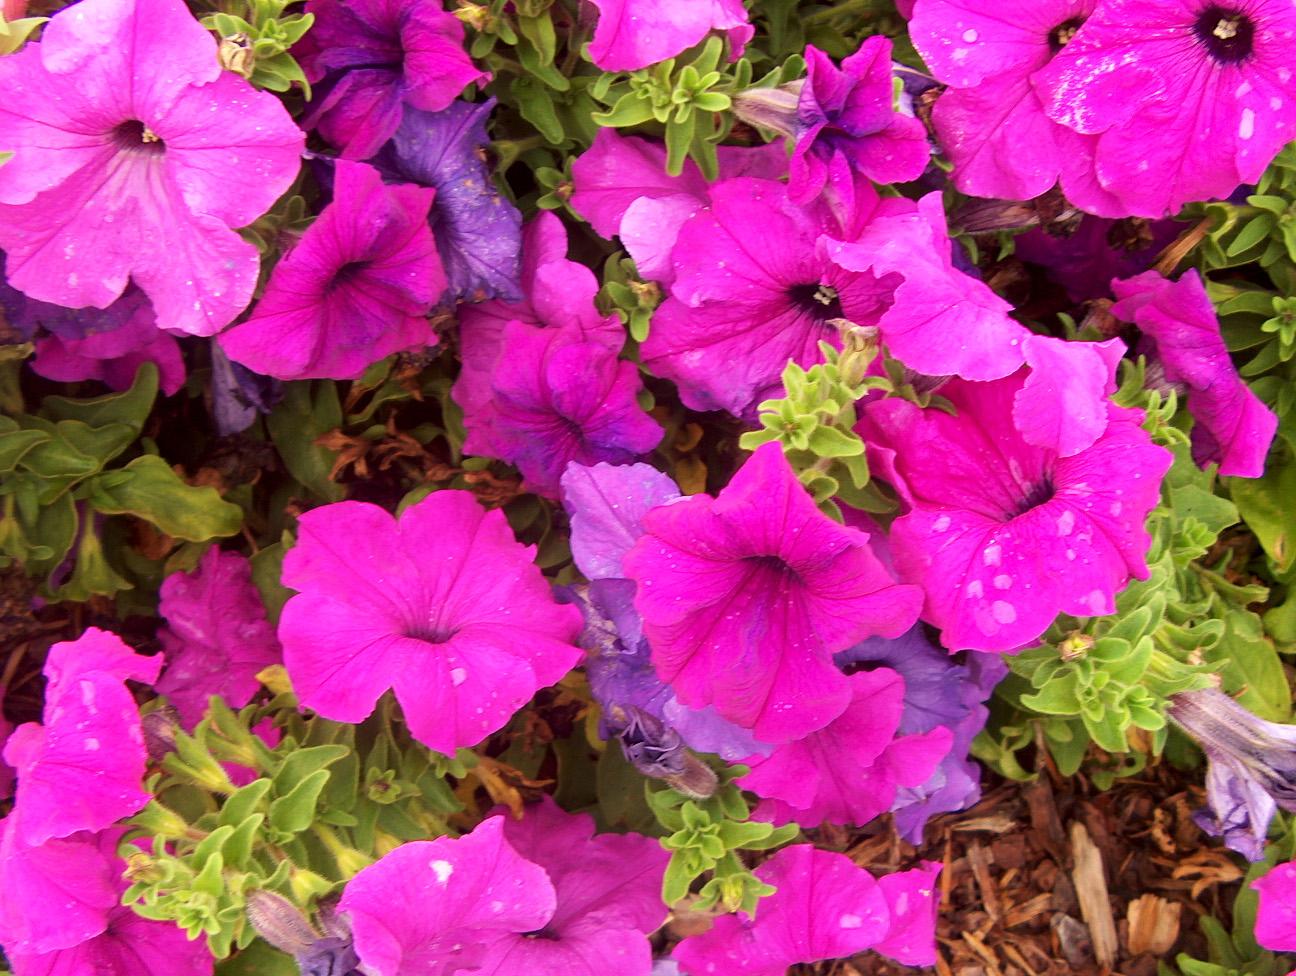 Petunia 'Limbo Violet' / Petunia 'Limbo Violet'